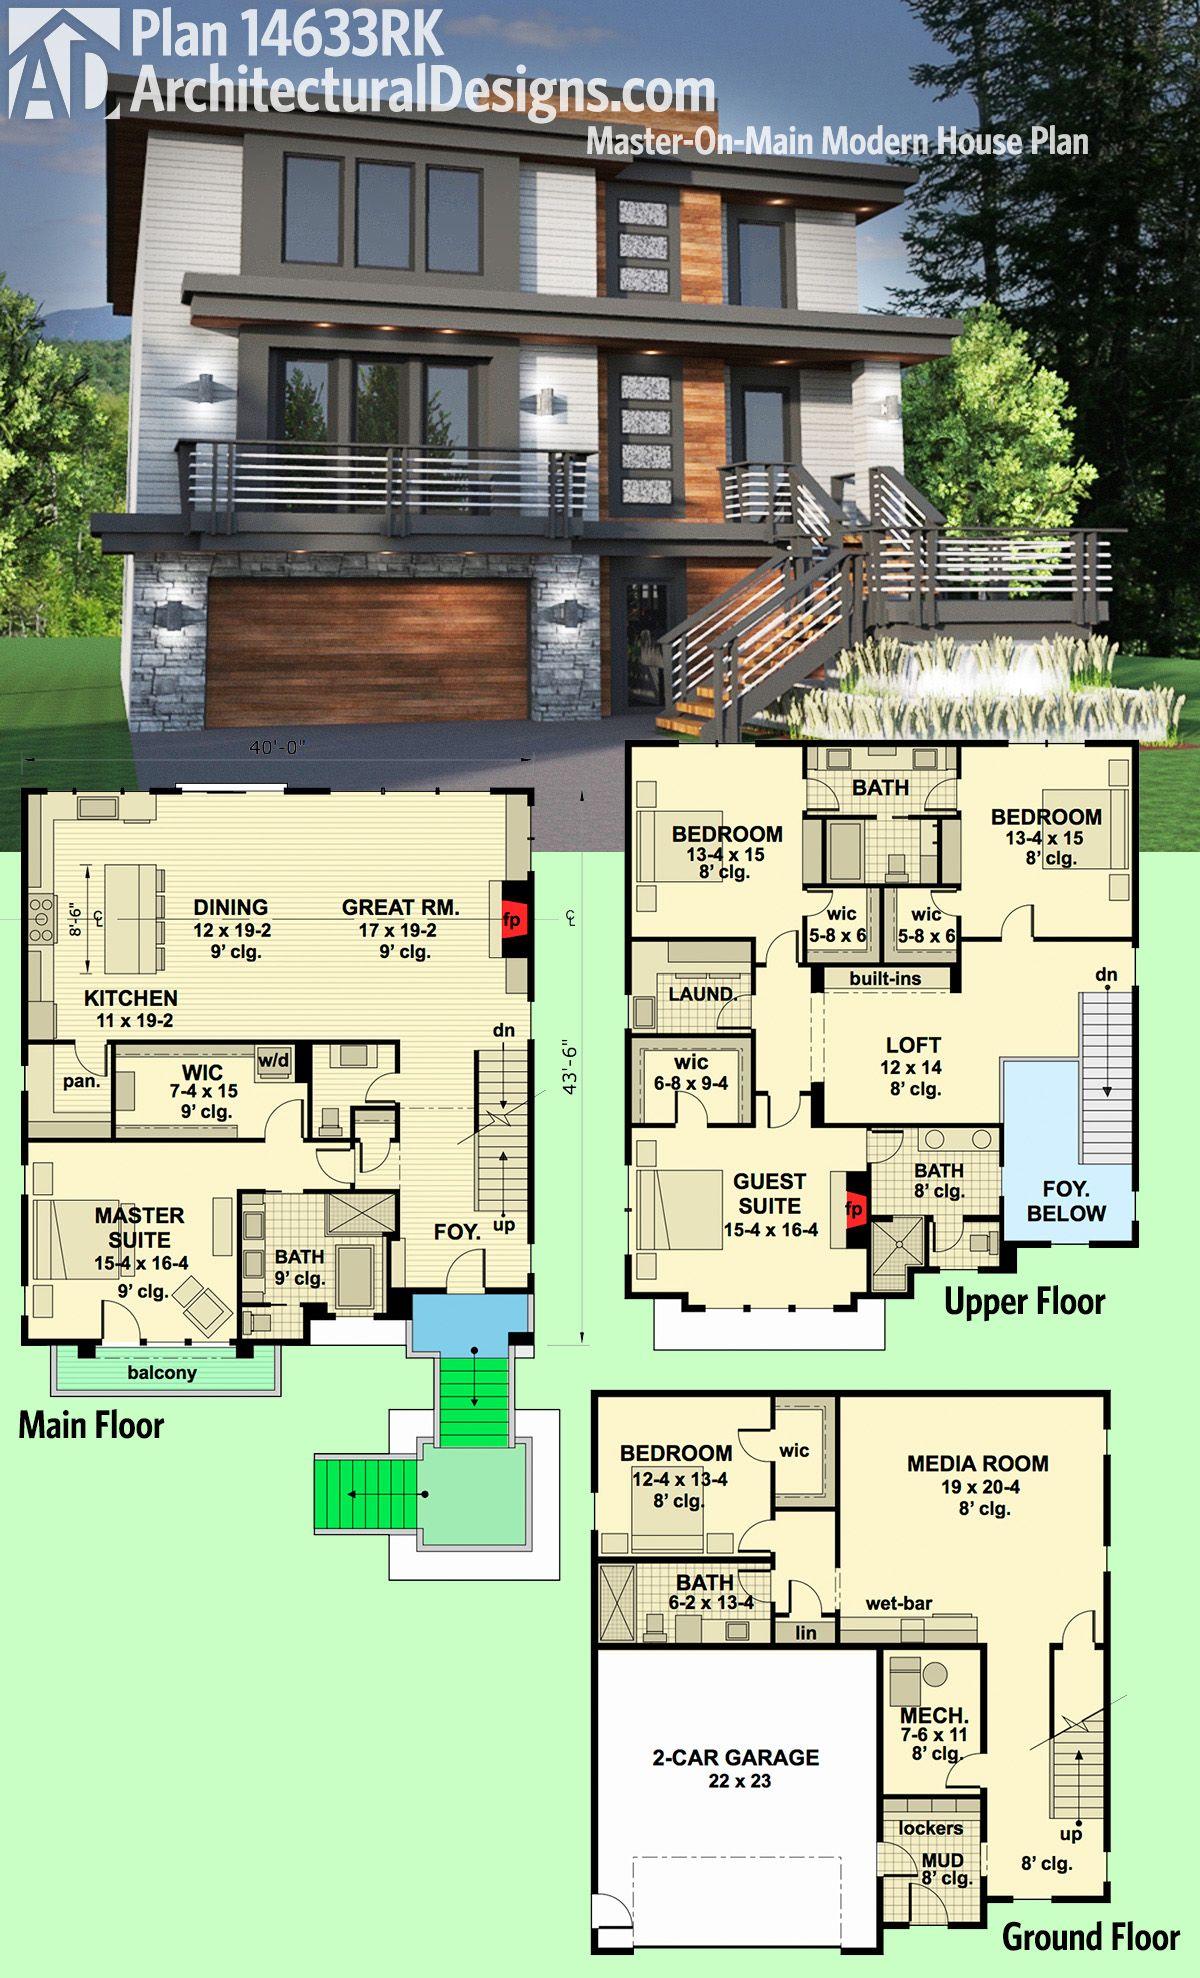 Plan 14633rk Master On Main Modern House Plan House Blueprints